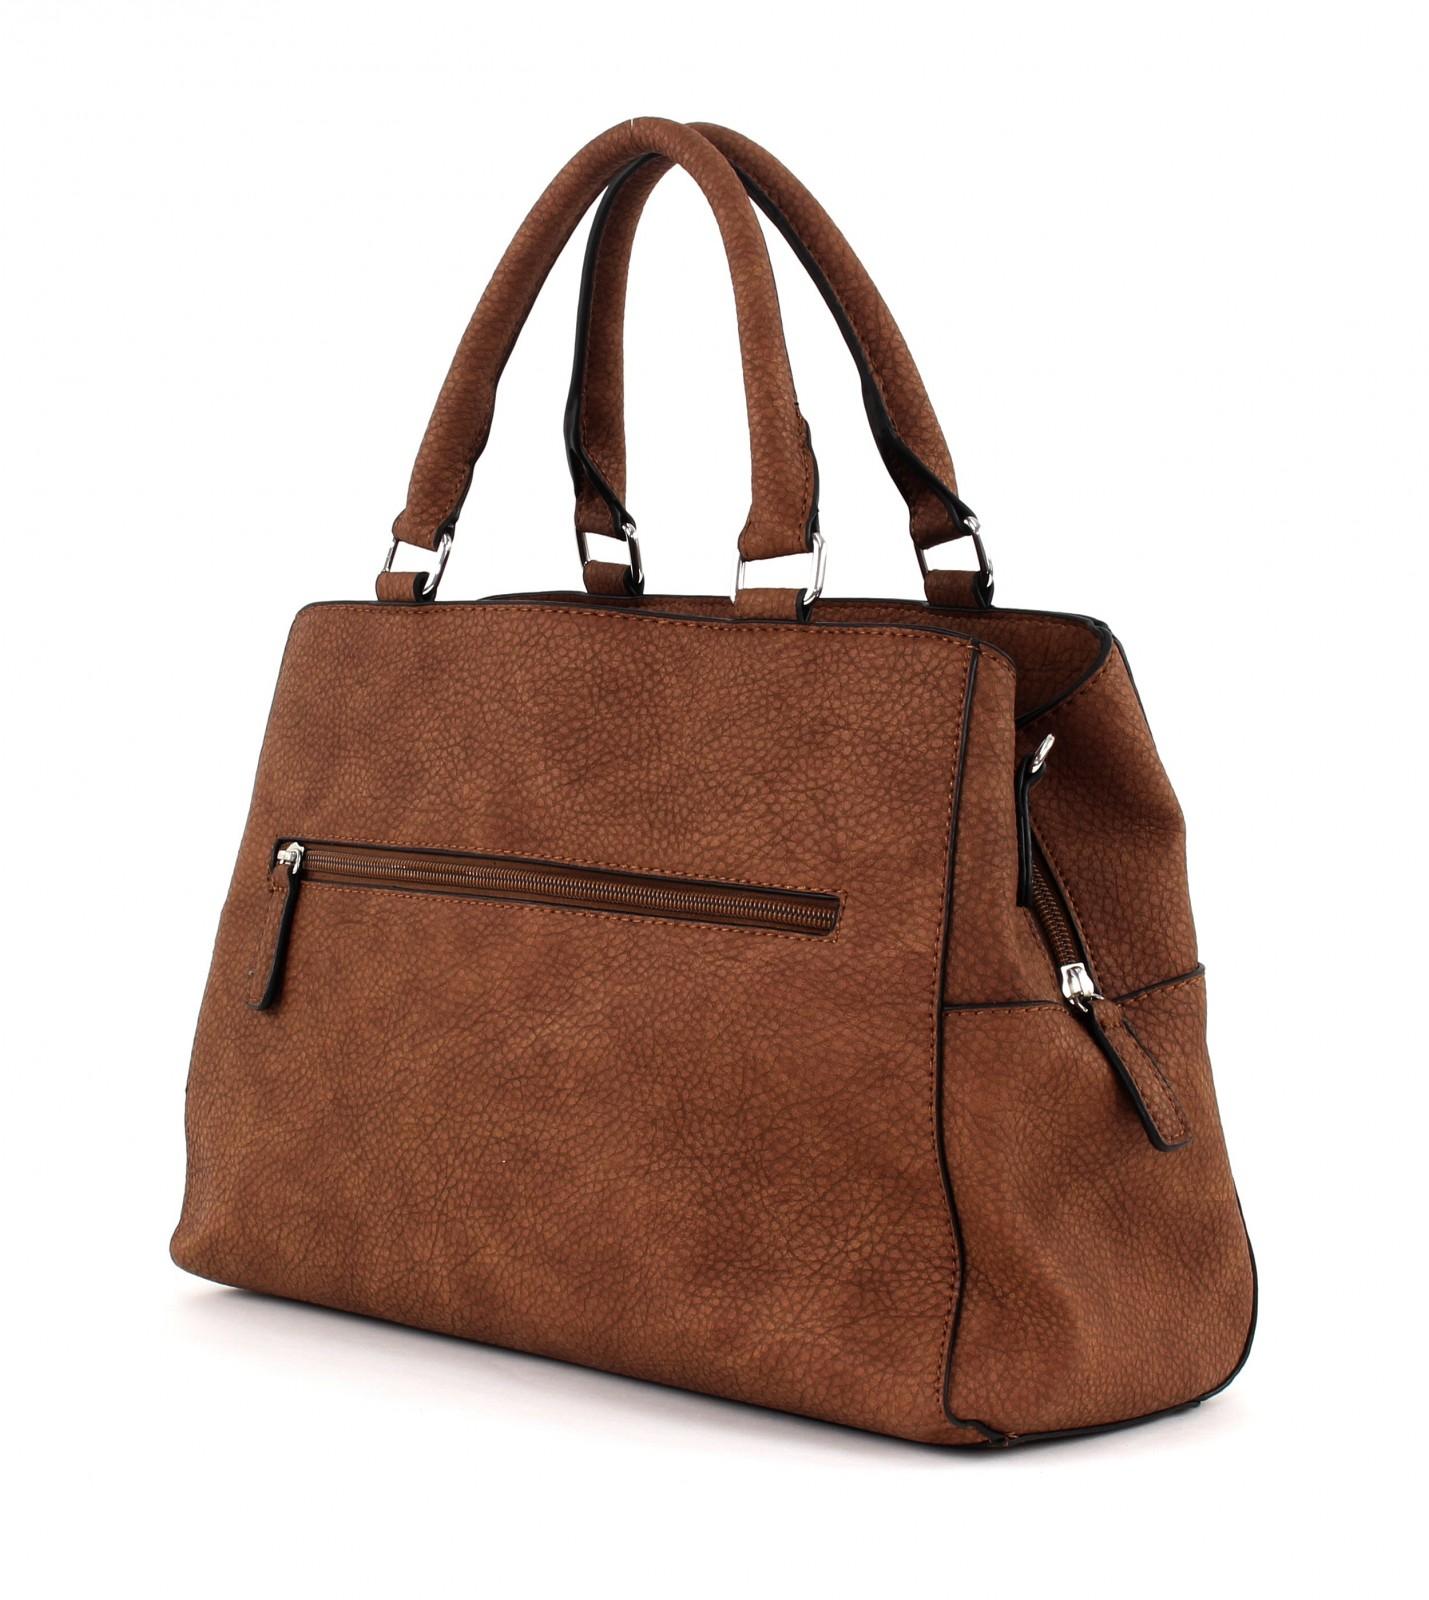 gerry weber handbag talk different ii l cognac. Black Bedroom Furniture Sets. Home Design Ideas